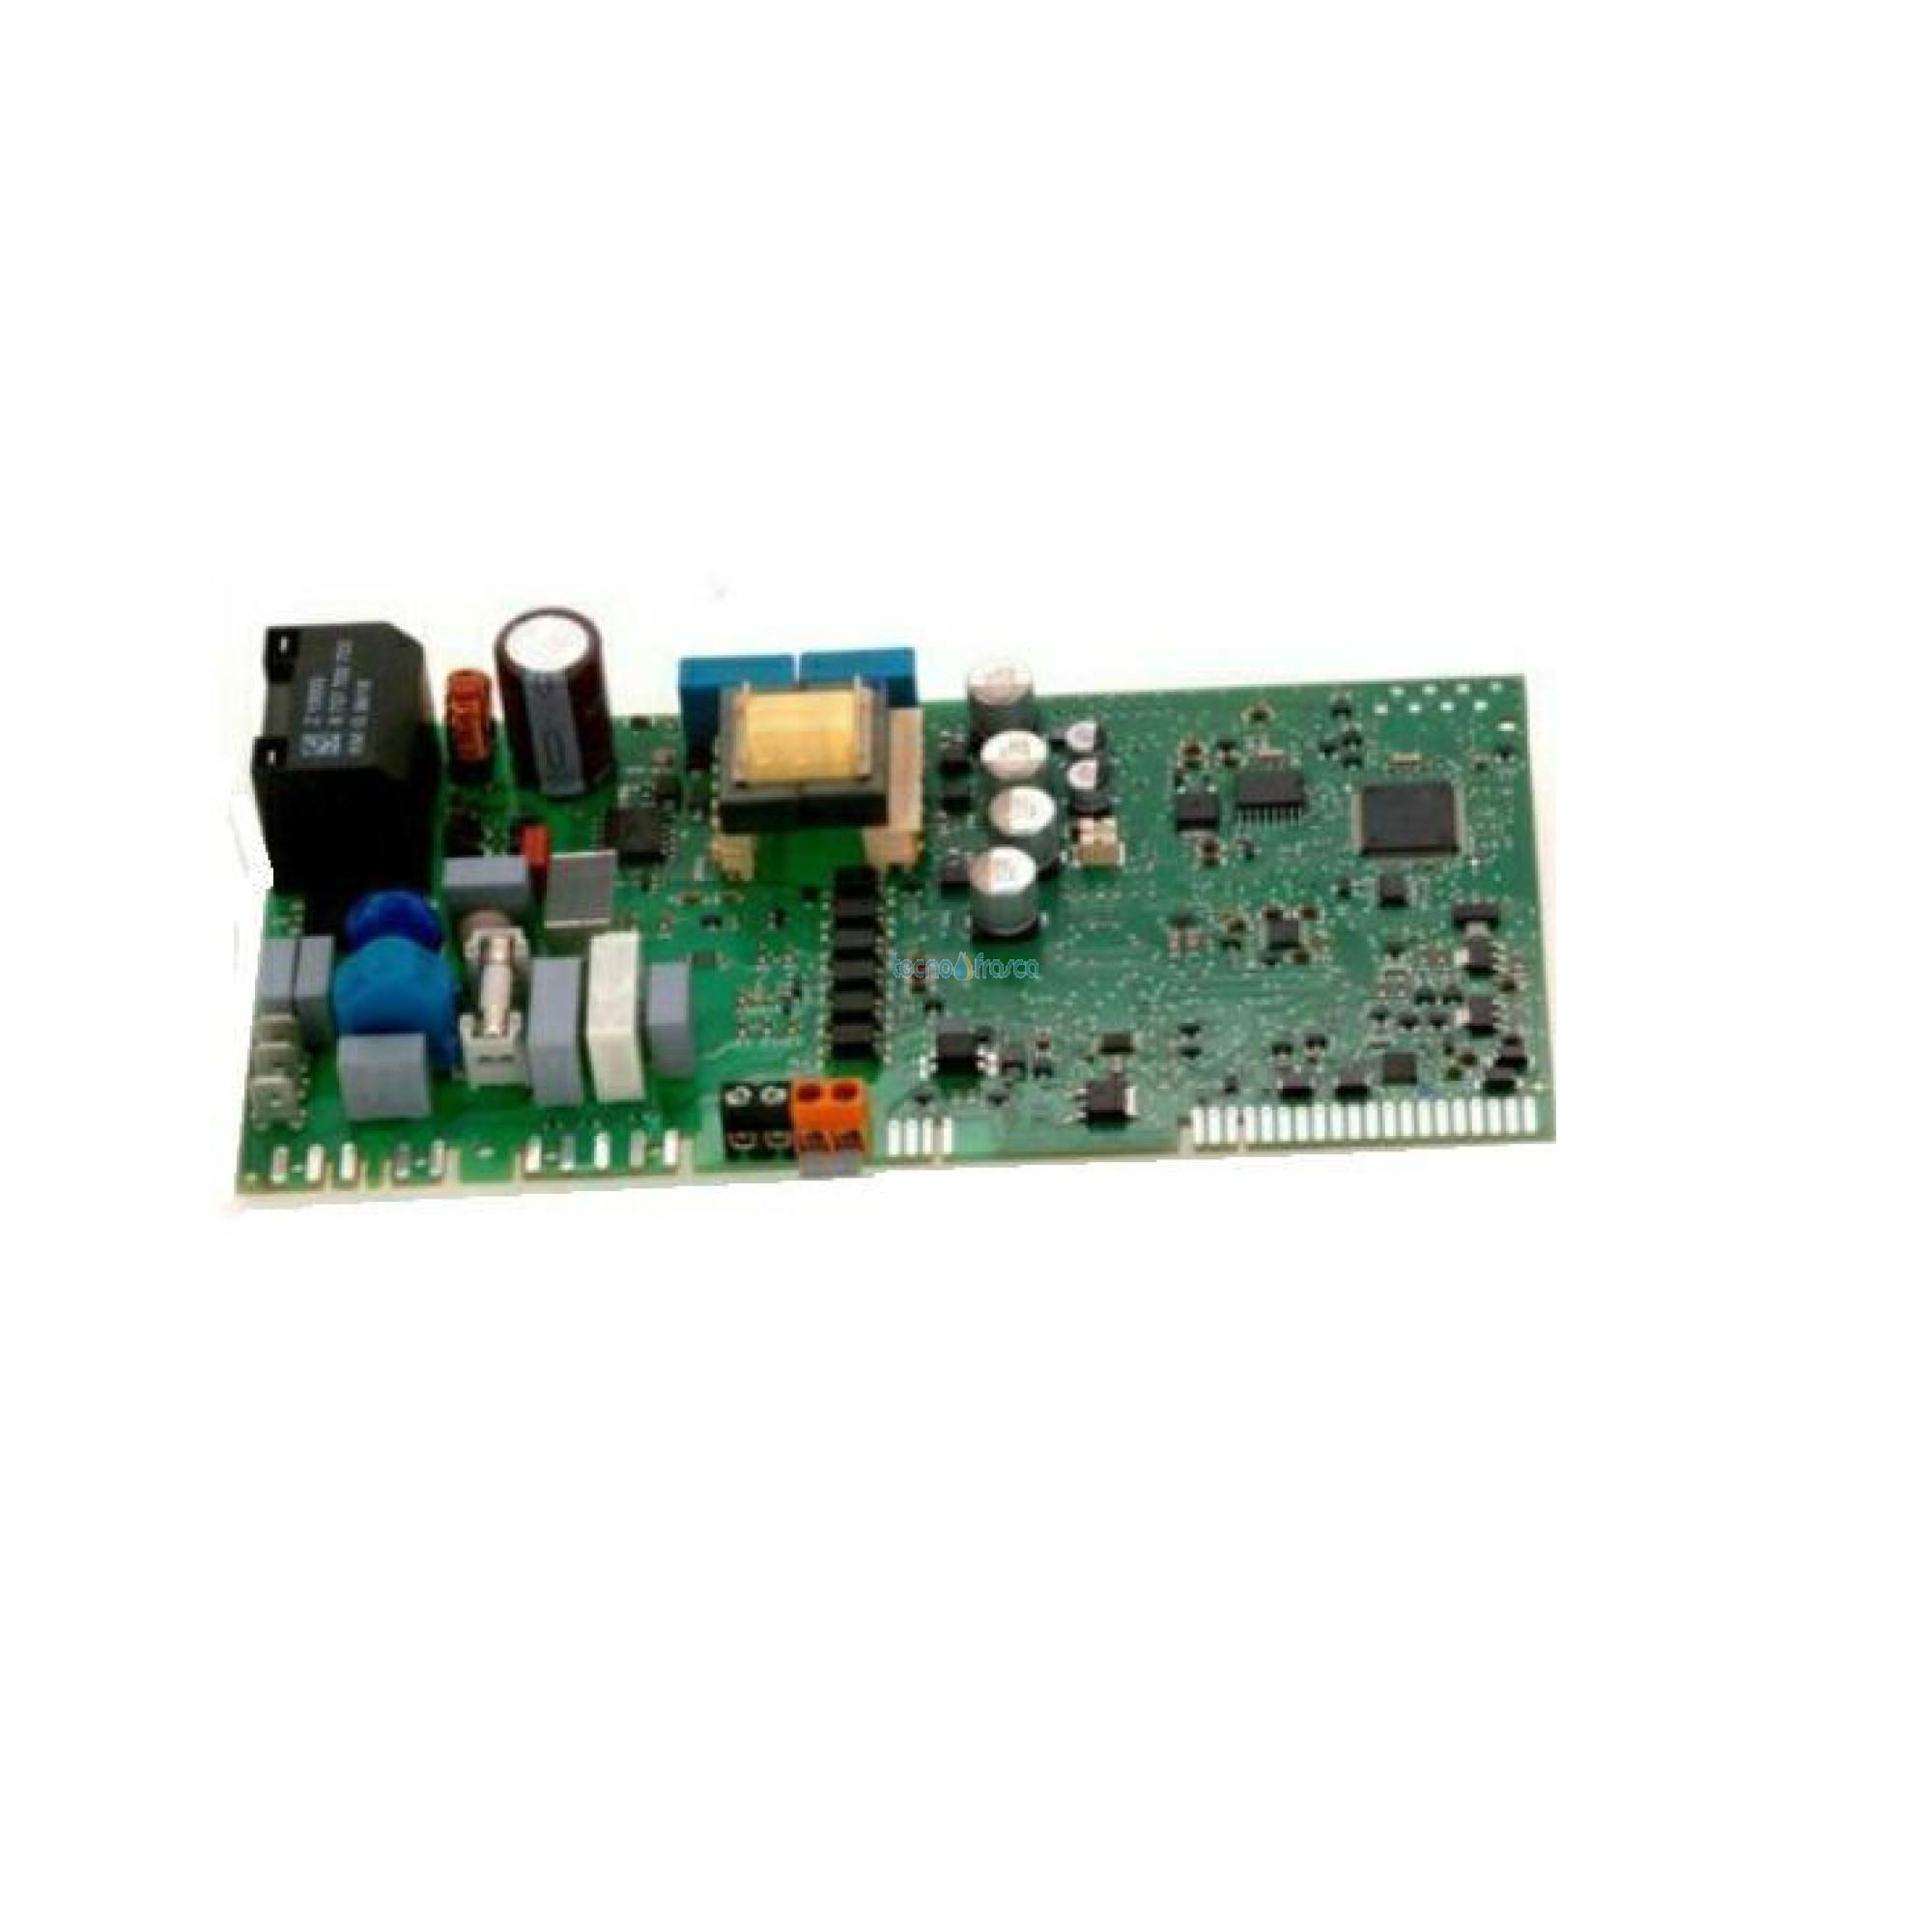 Junkers bosch scheda elettronica 8638900134